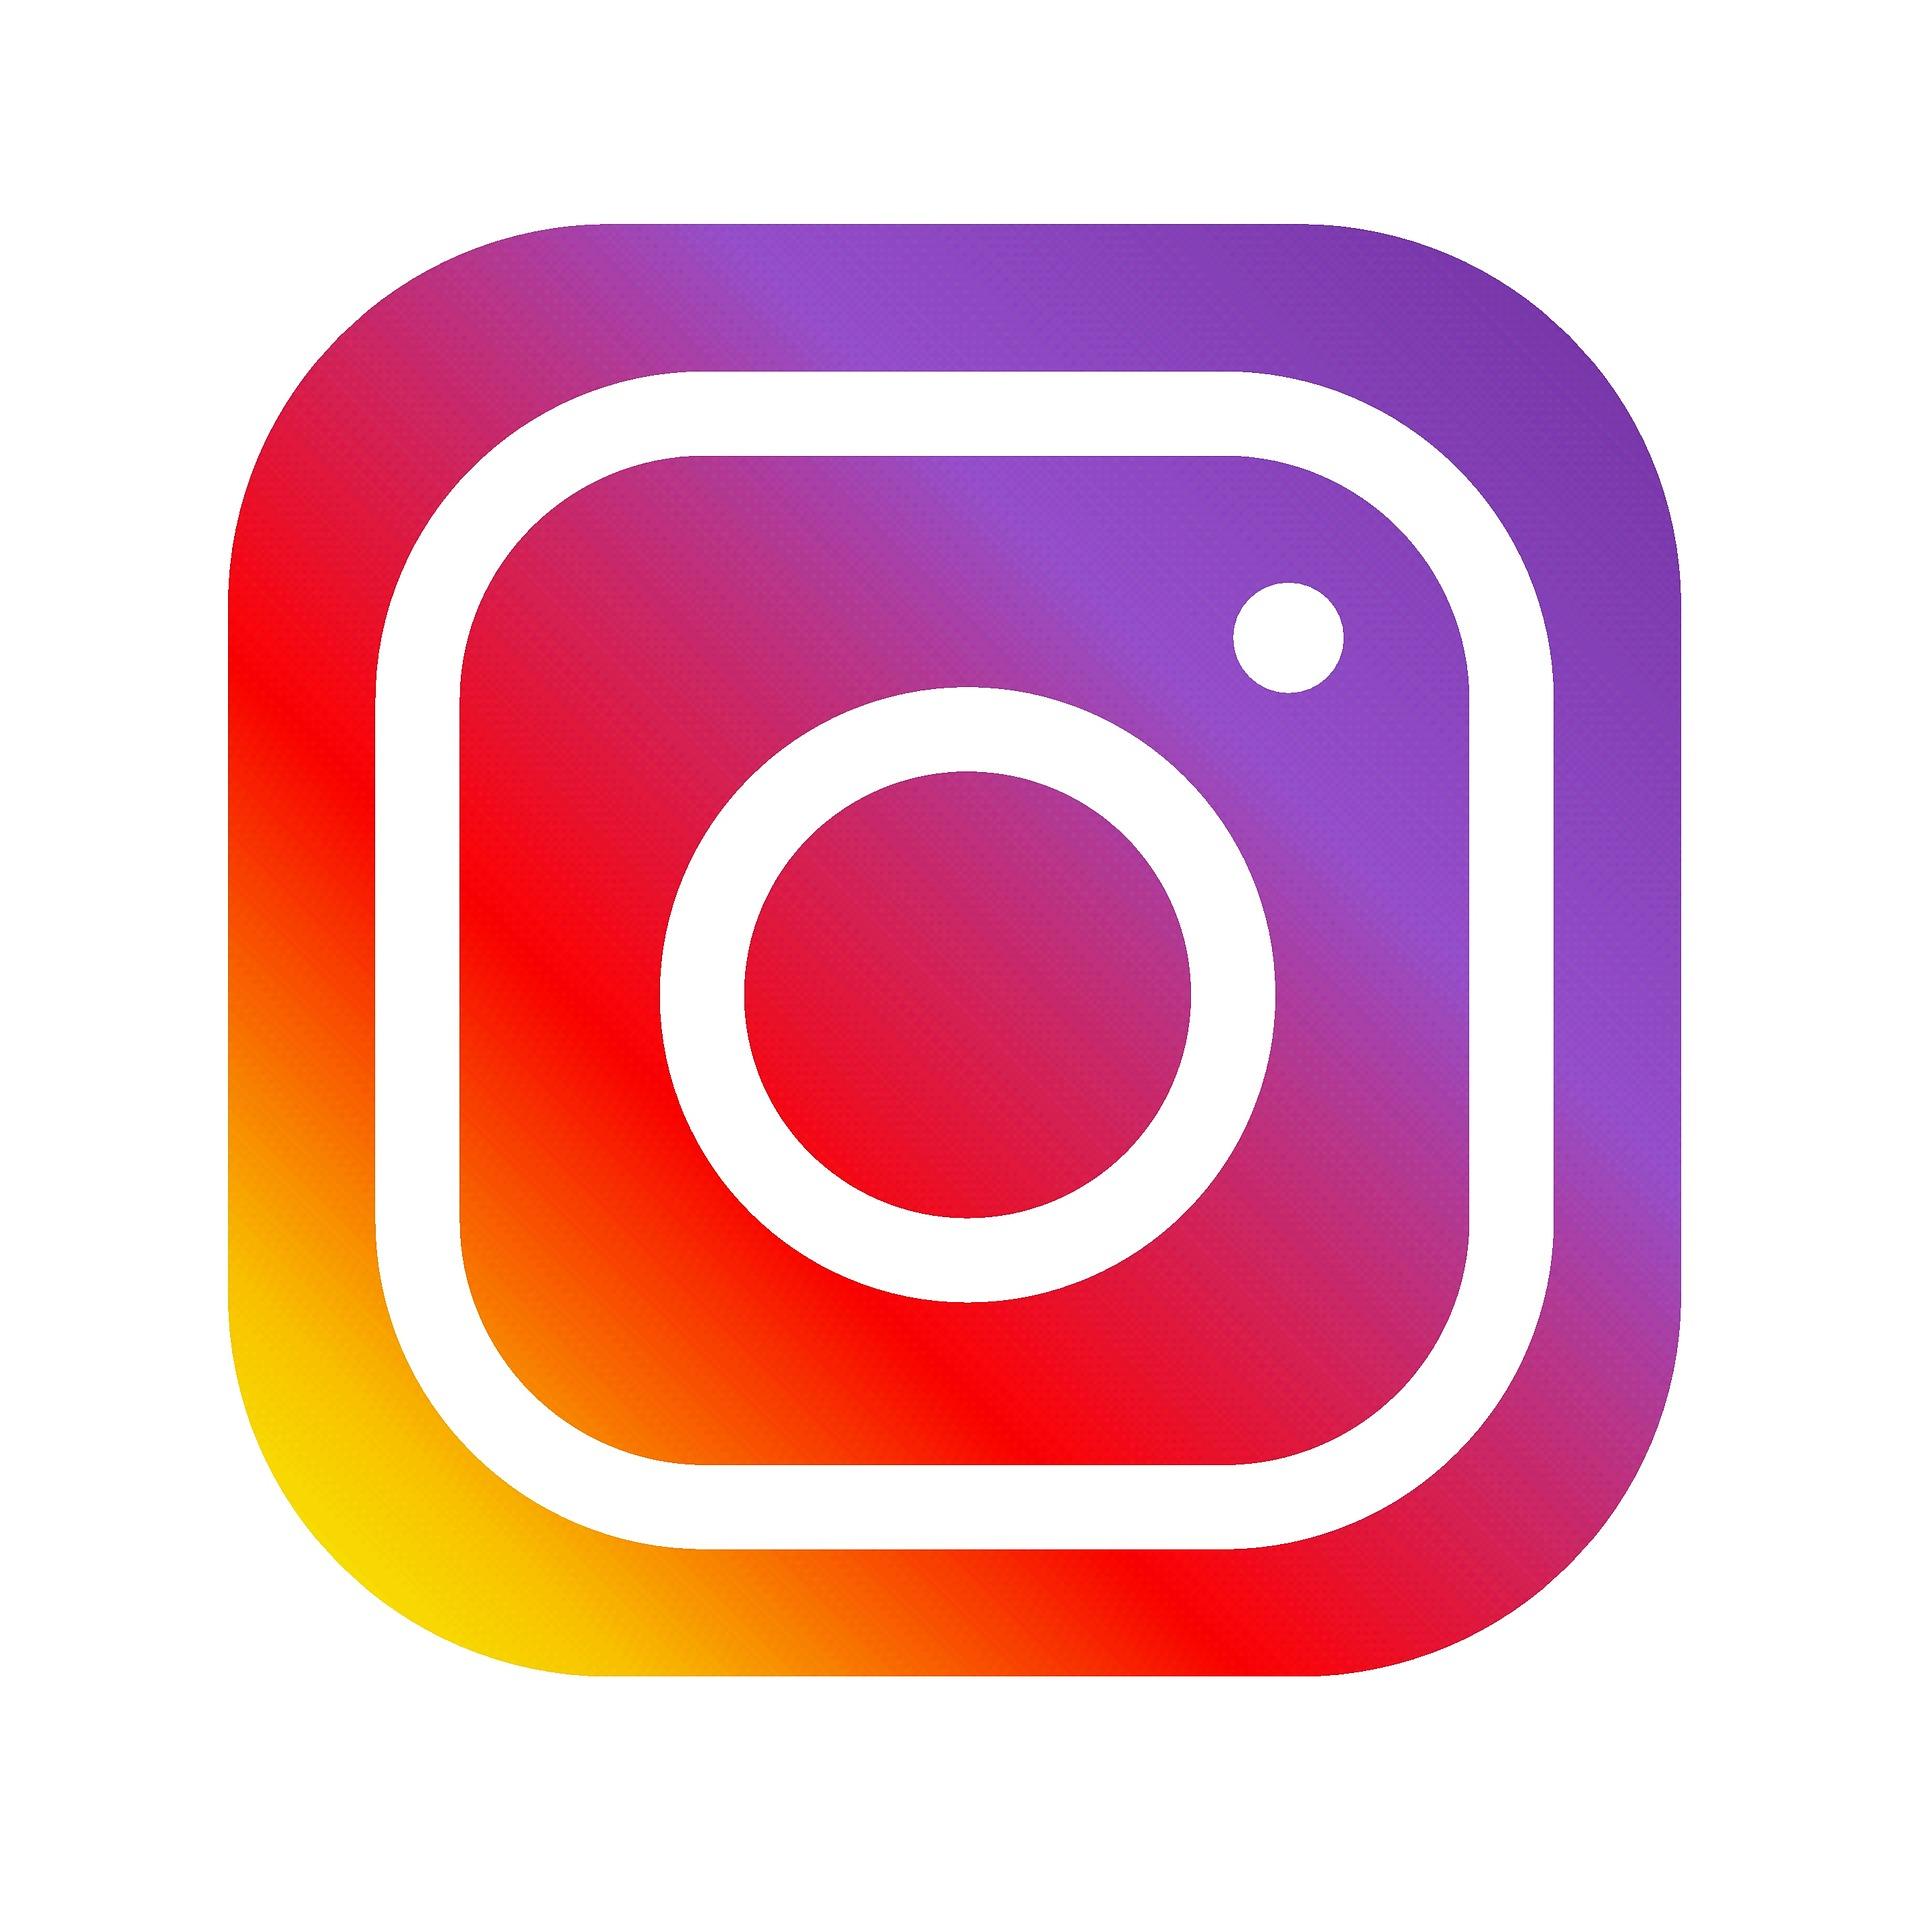 1920x1905 New Instagram Logo Clipart